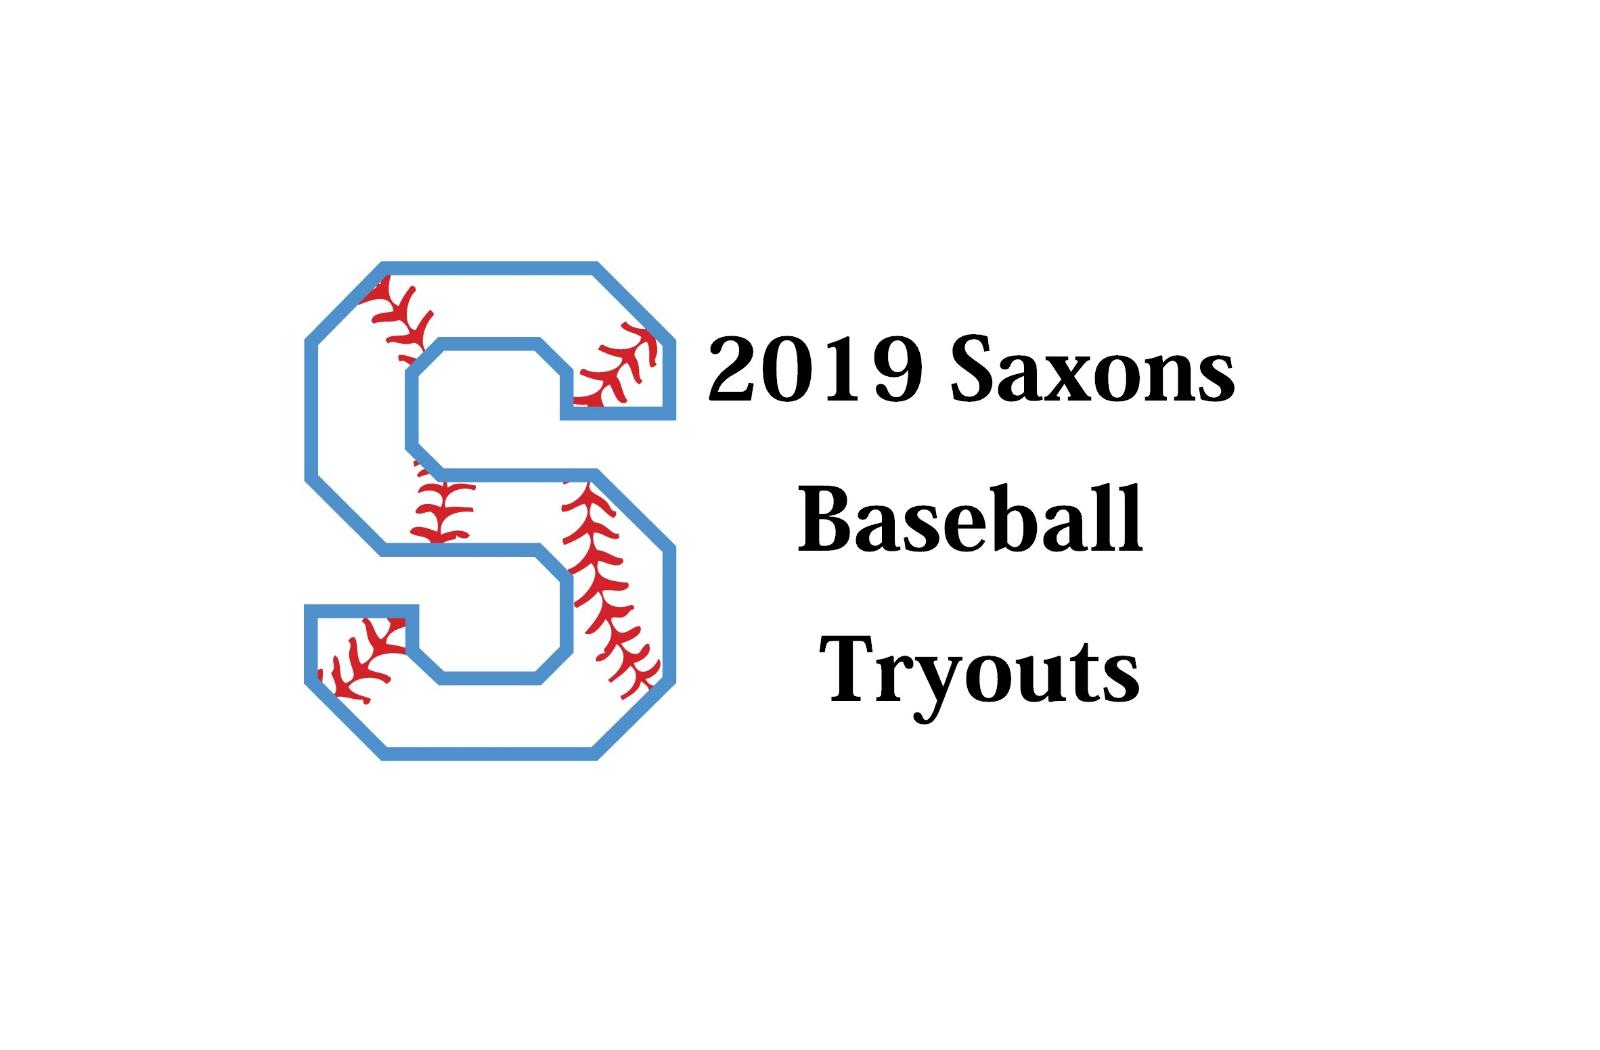 2019 Saxon Baseball Tryouts Information